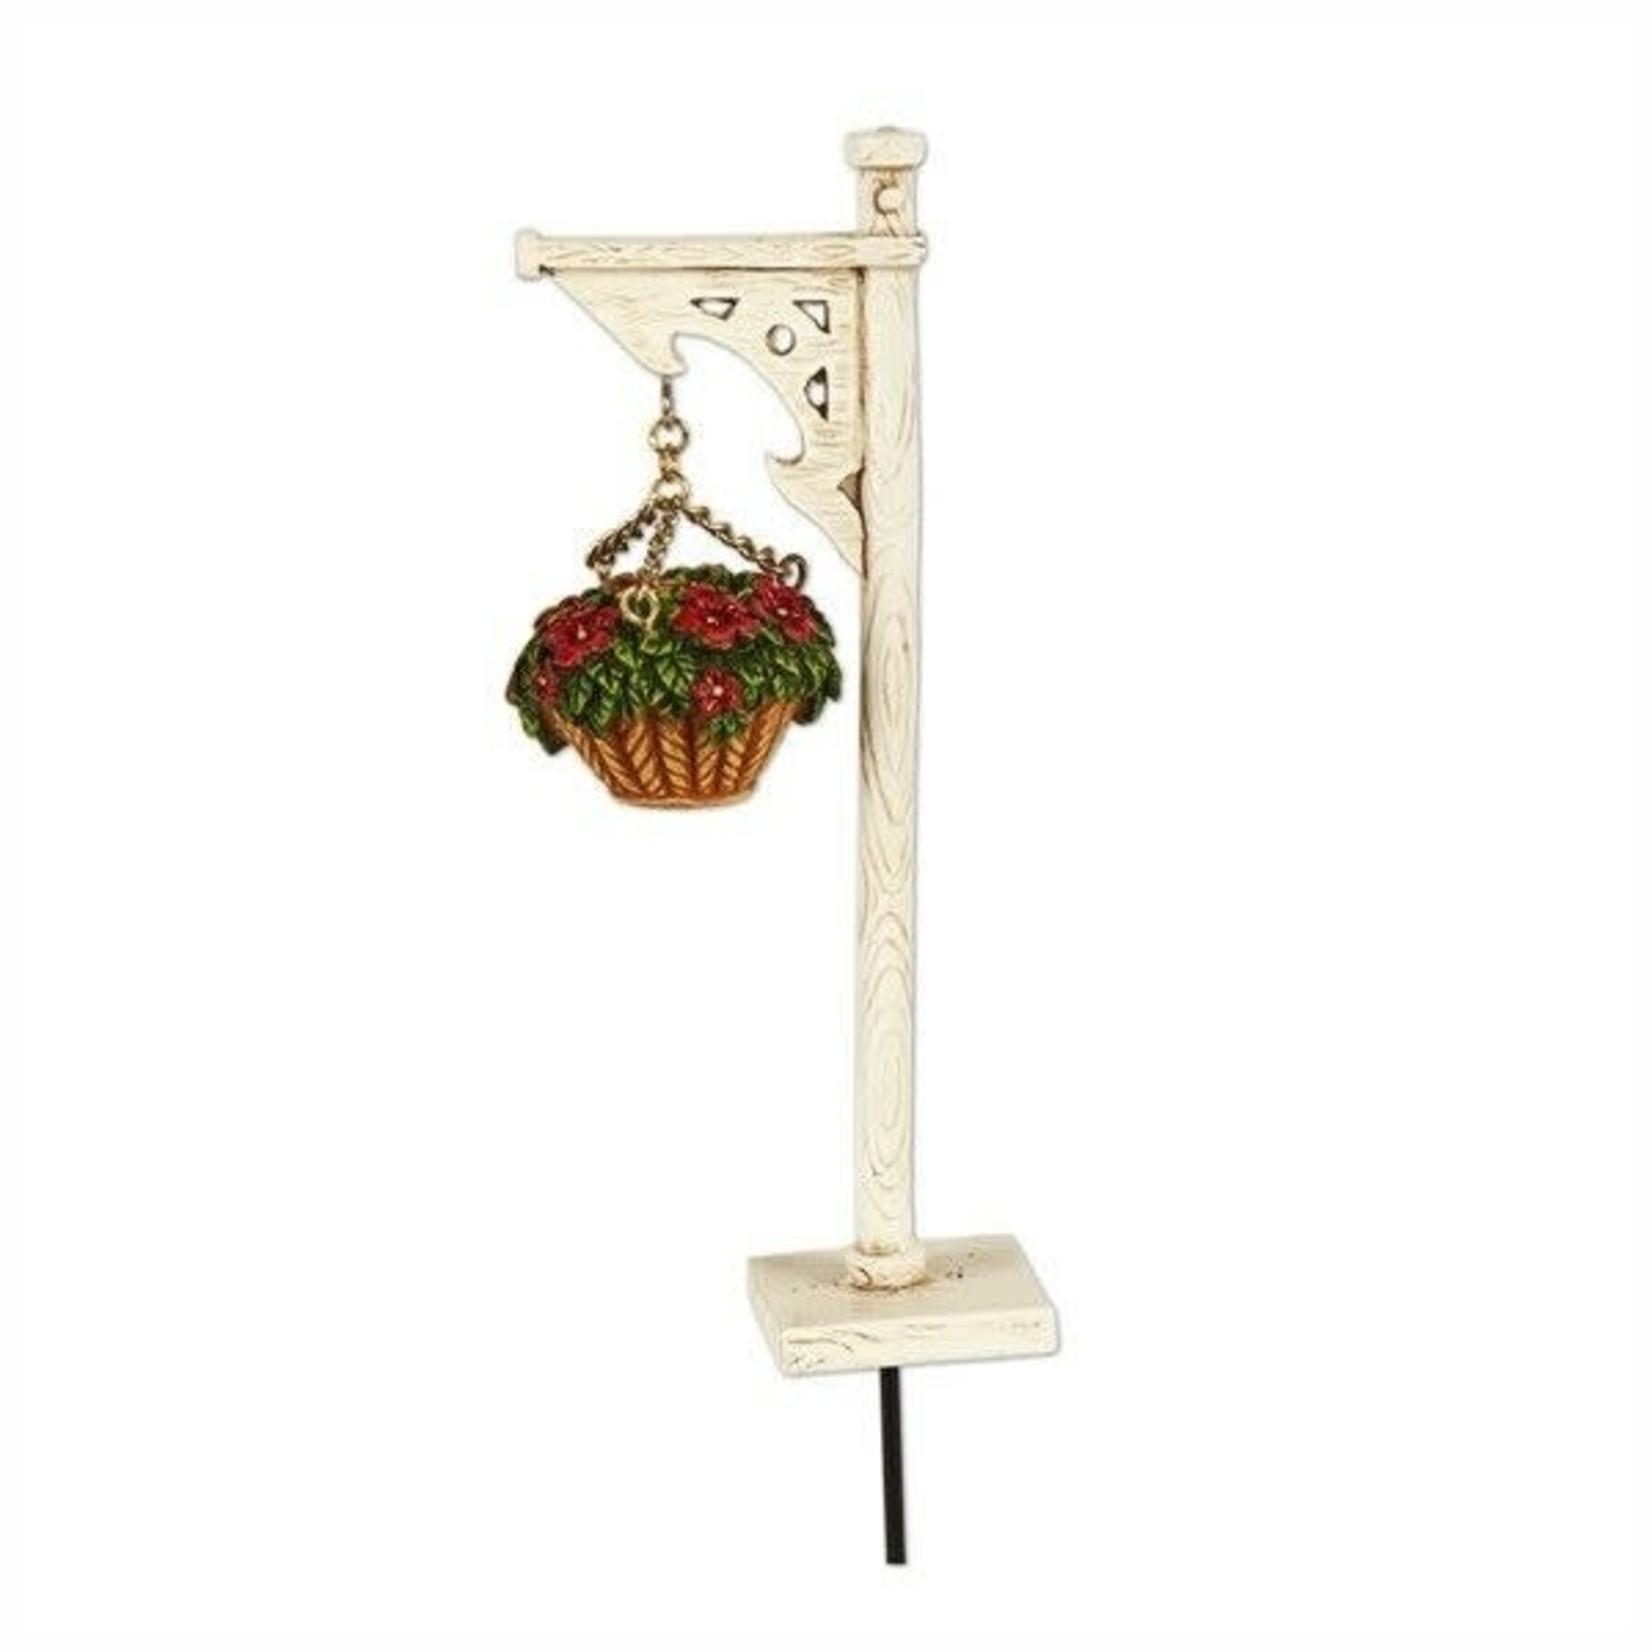 Studio M Mini Hanging Basket w/ Stand